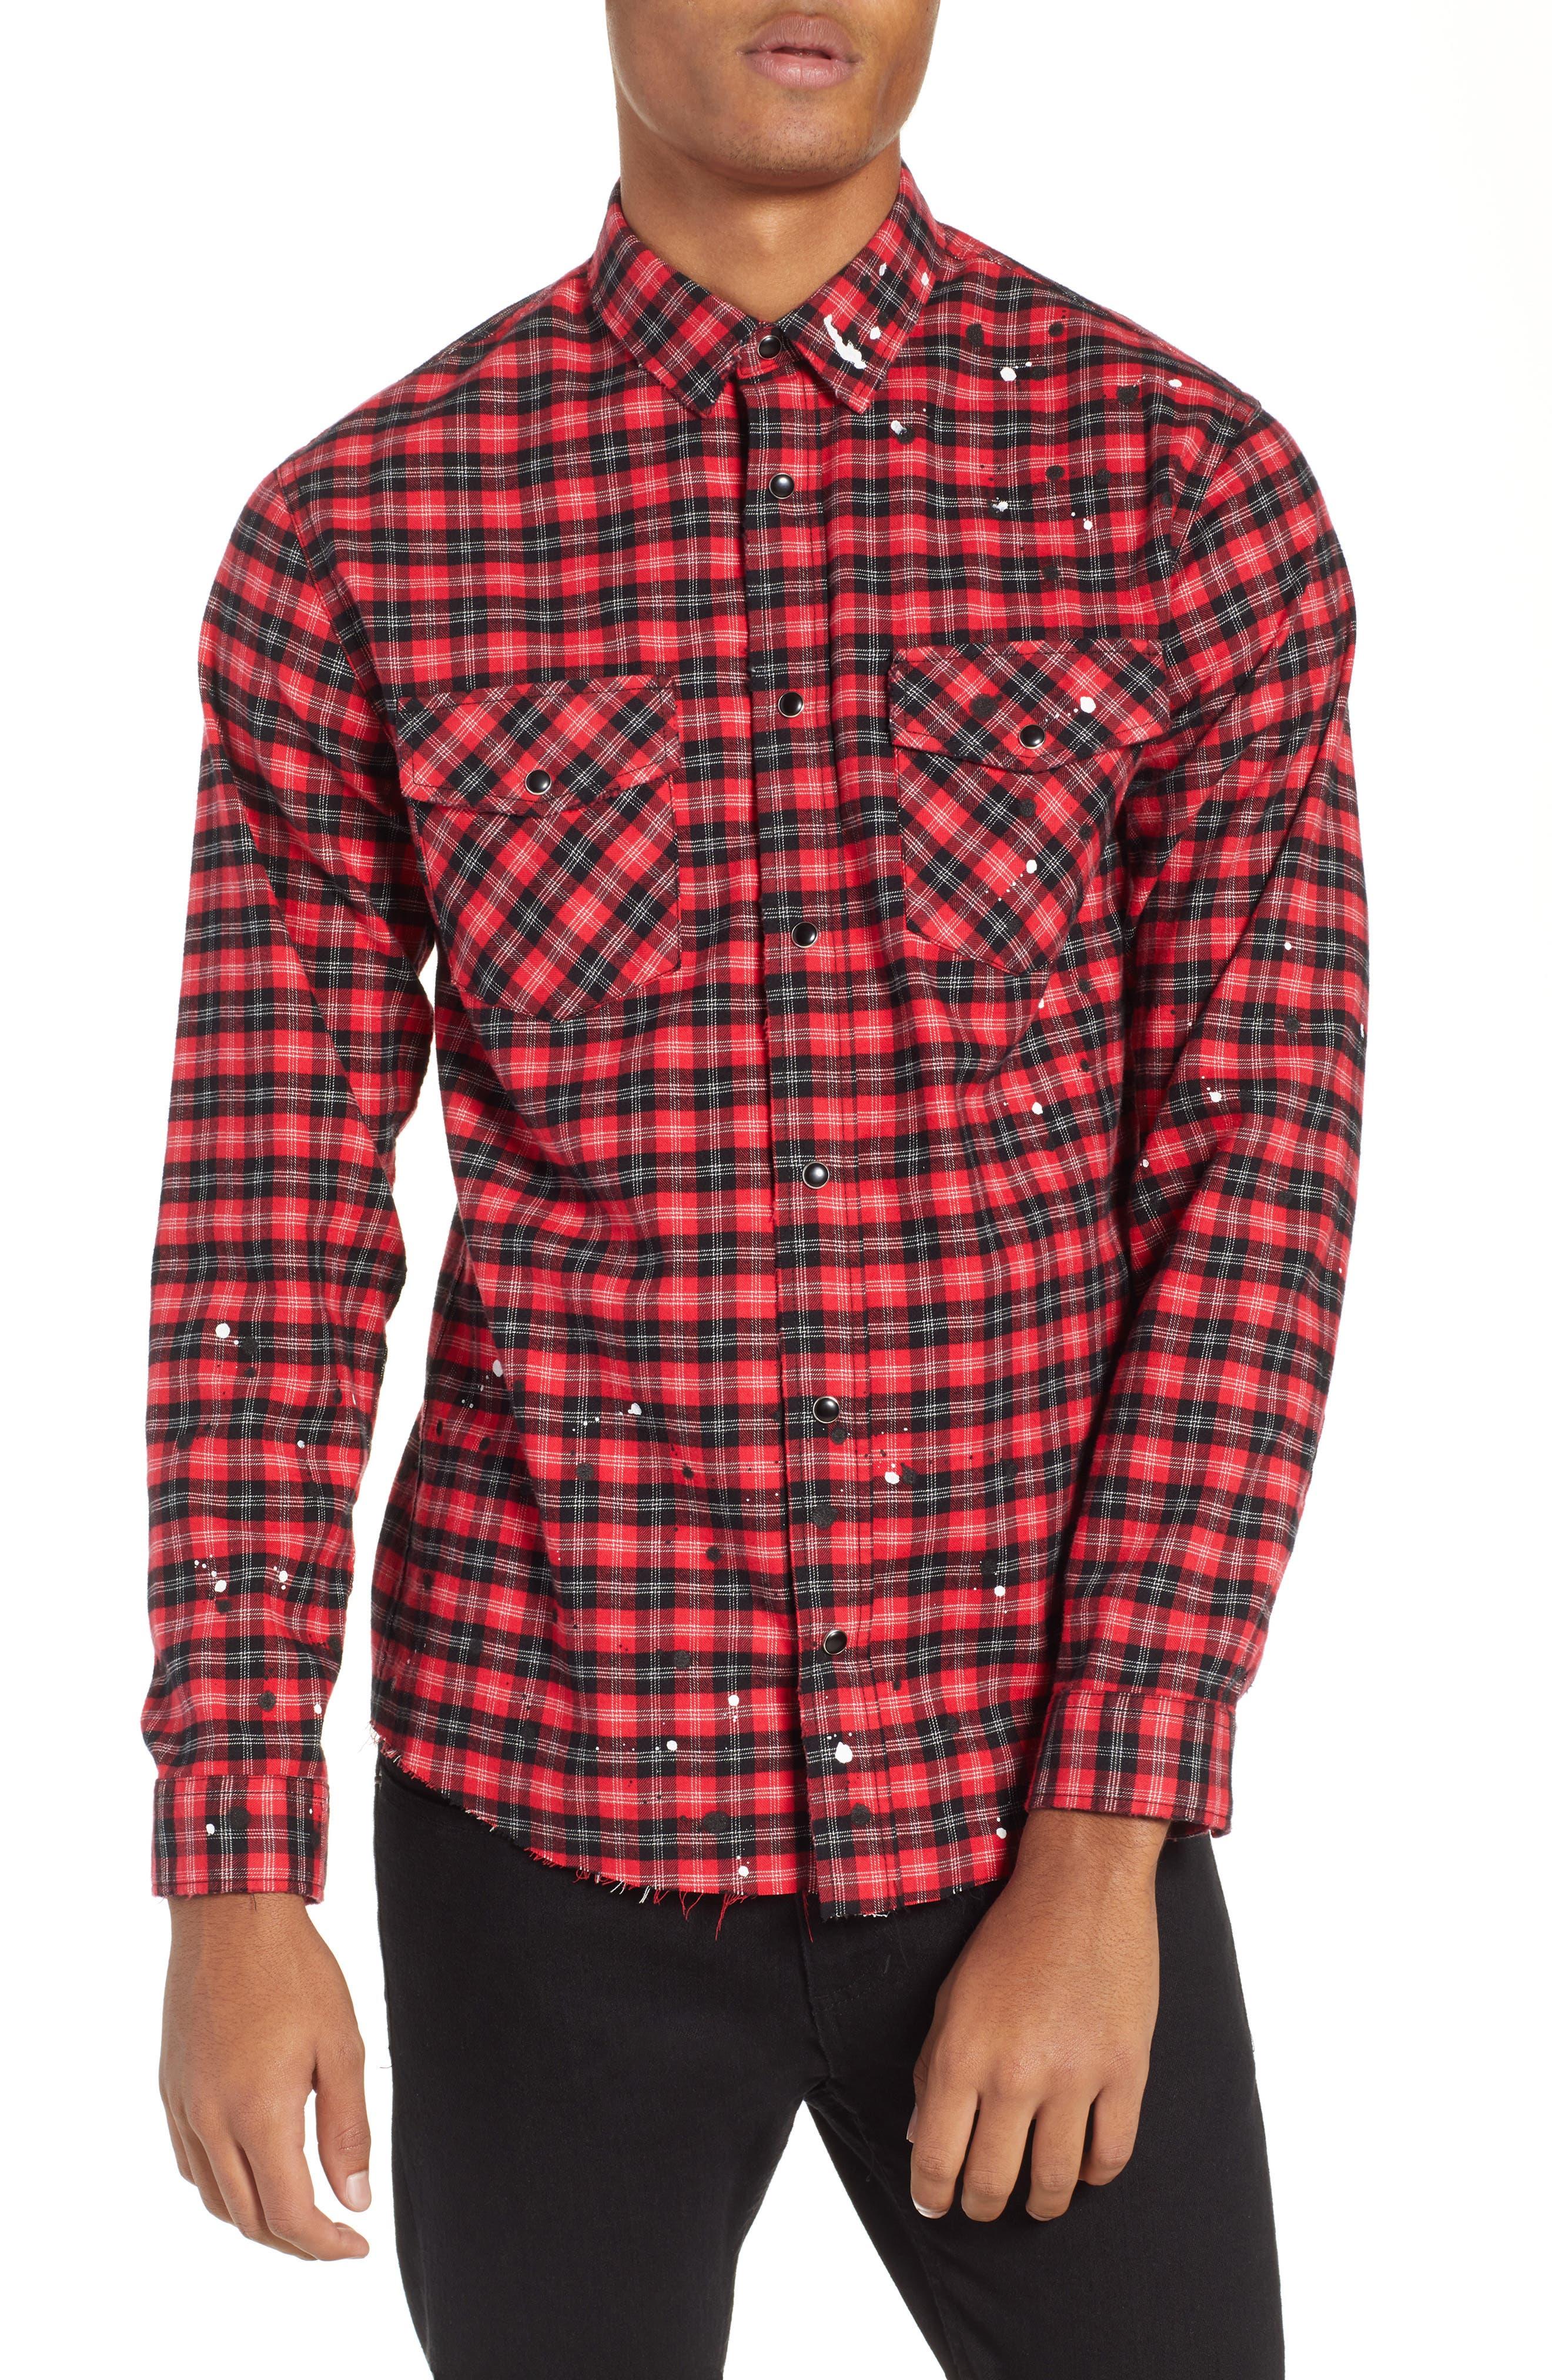 THE KOOPLES Slim Fit Paint Spatter Flannel Shirt, Main, color, 600